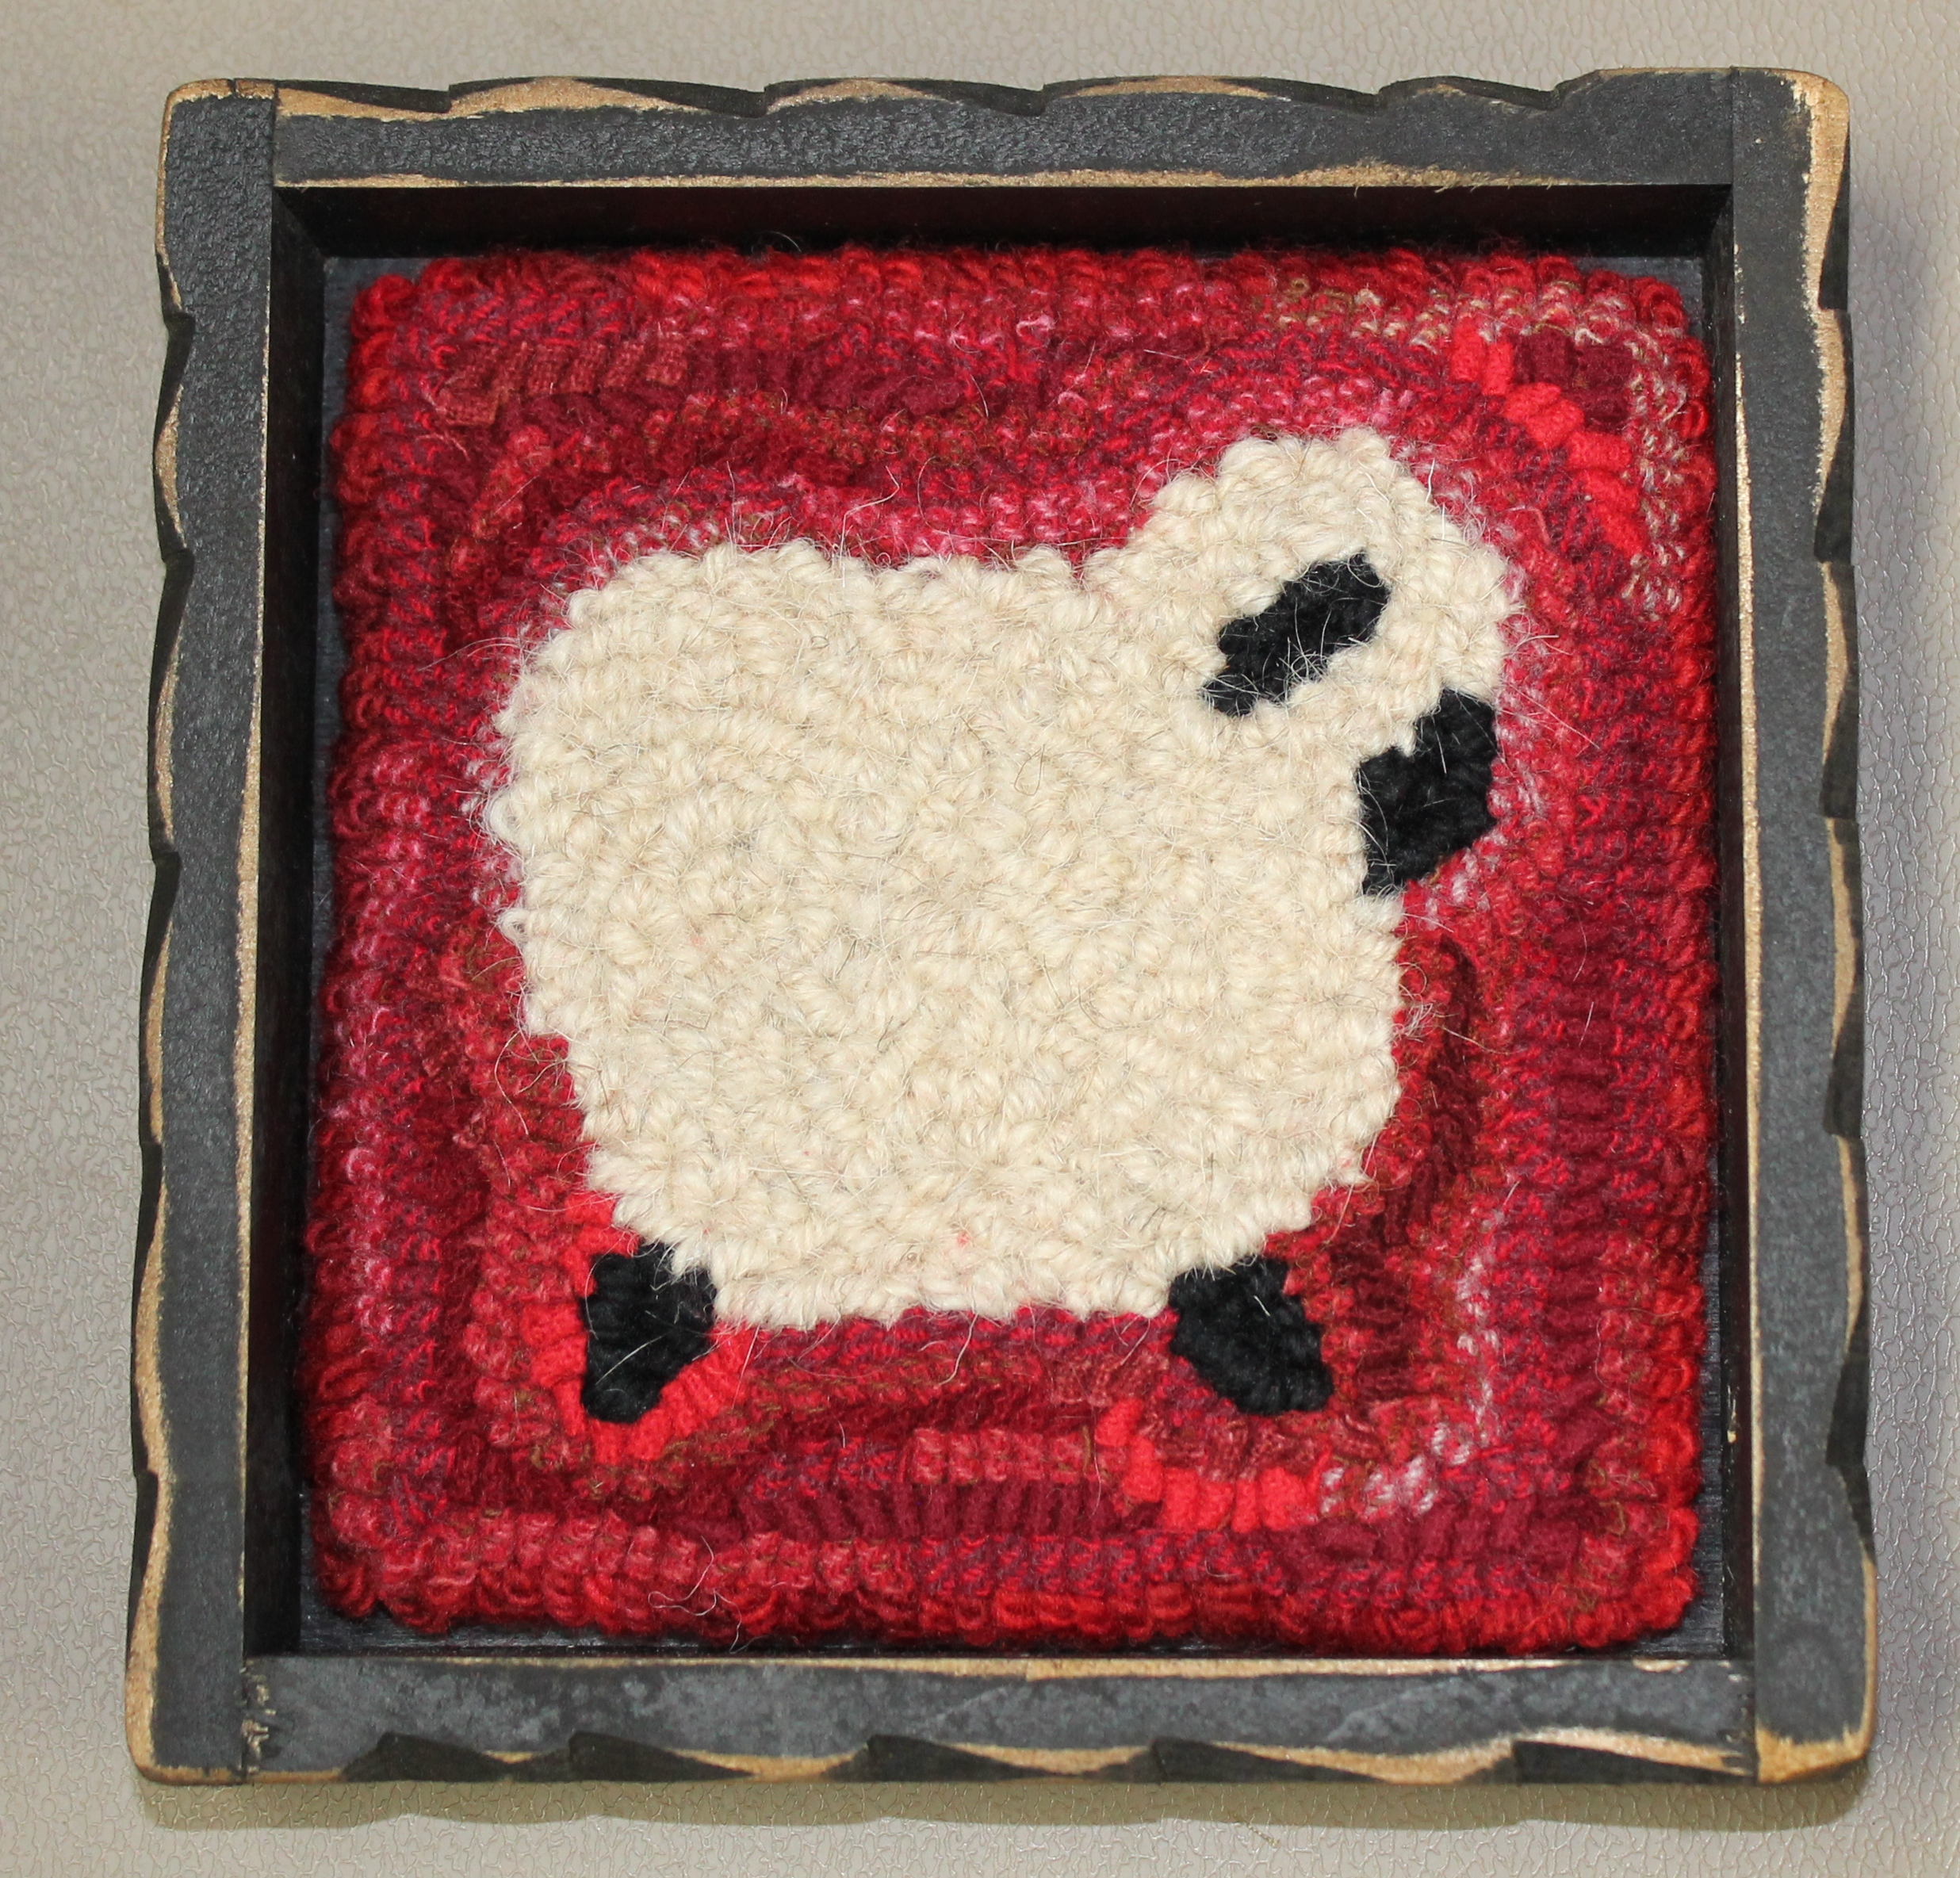 red-lamb-breezy-ridge-rugs-2019.jpg